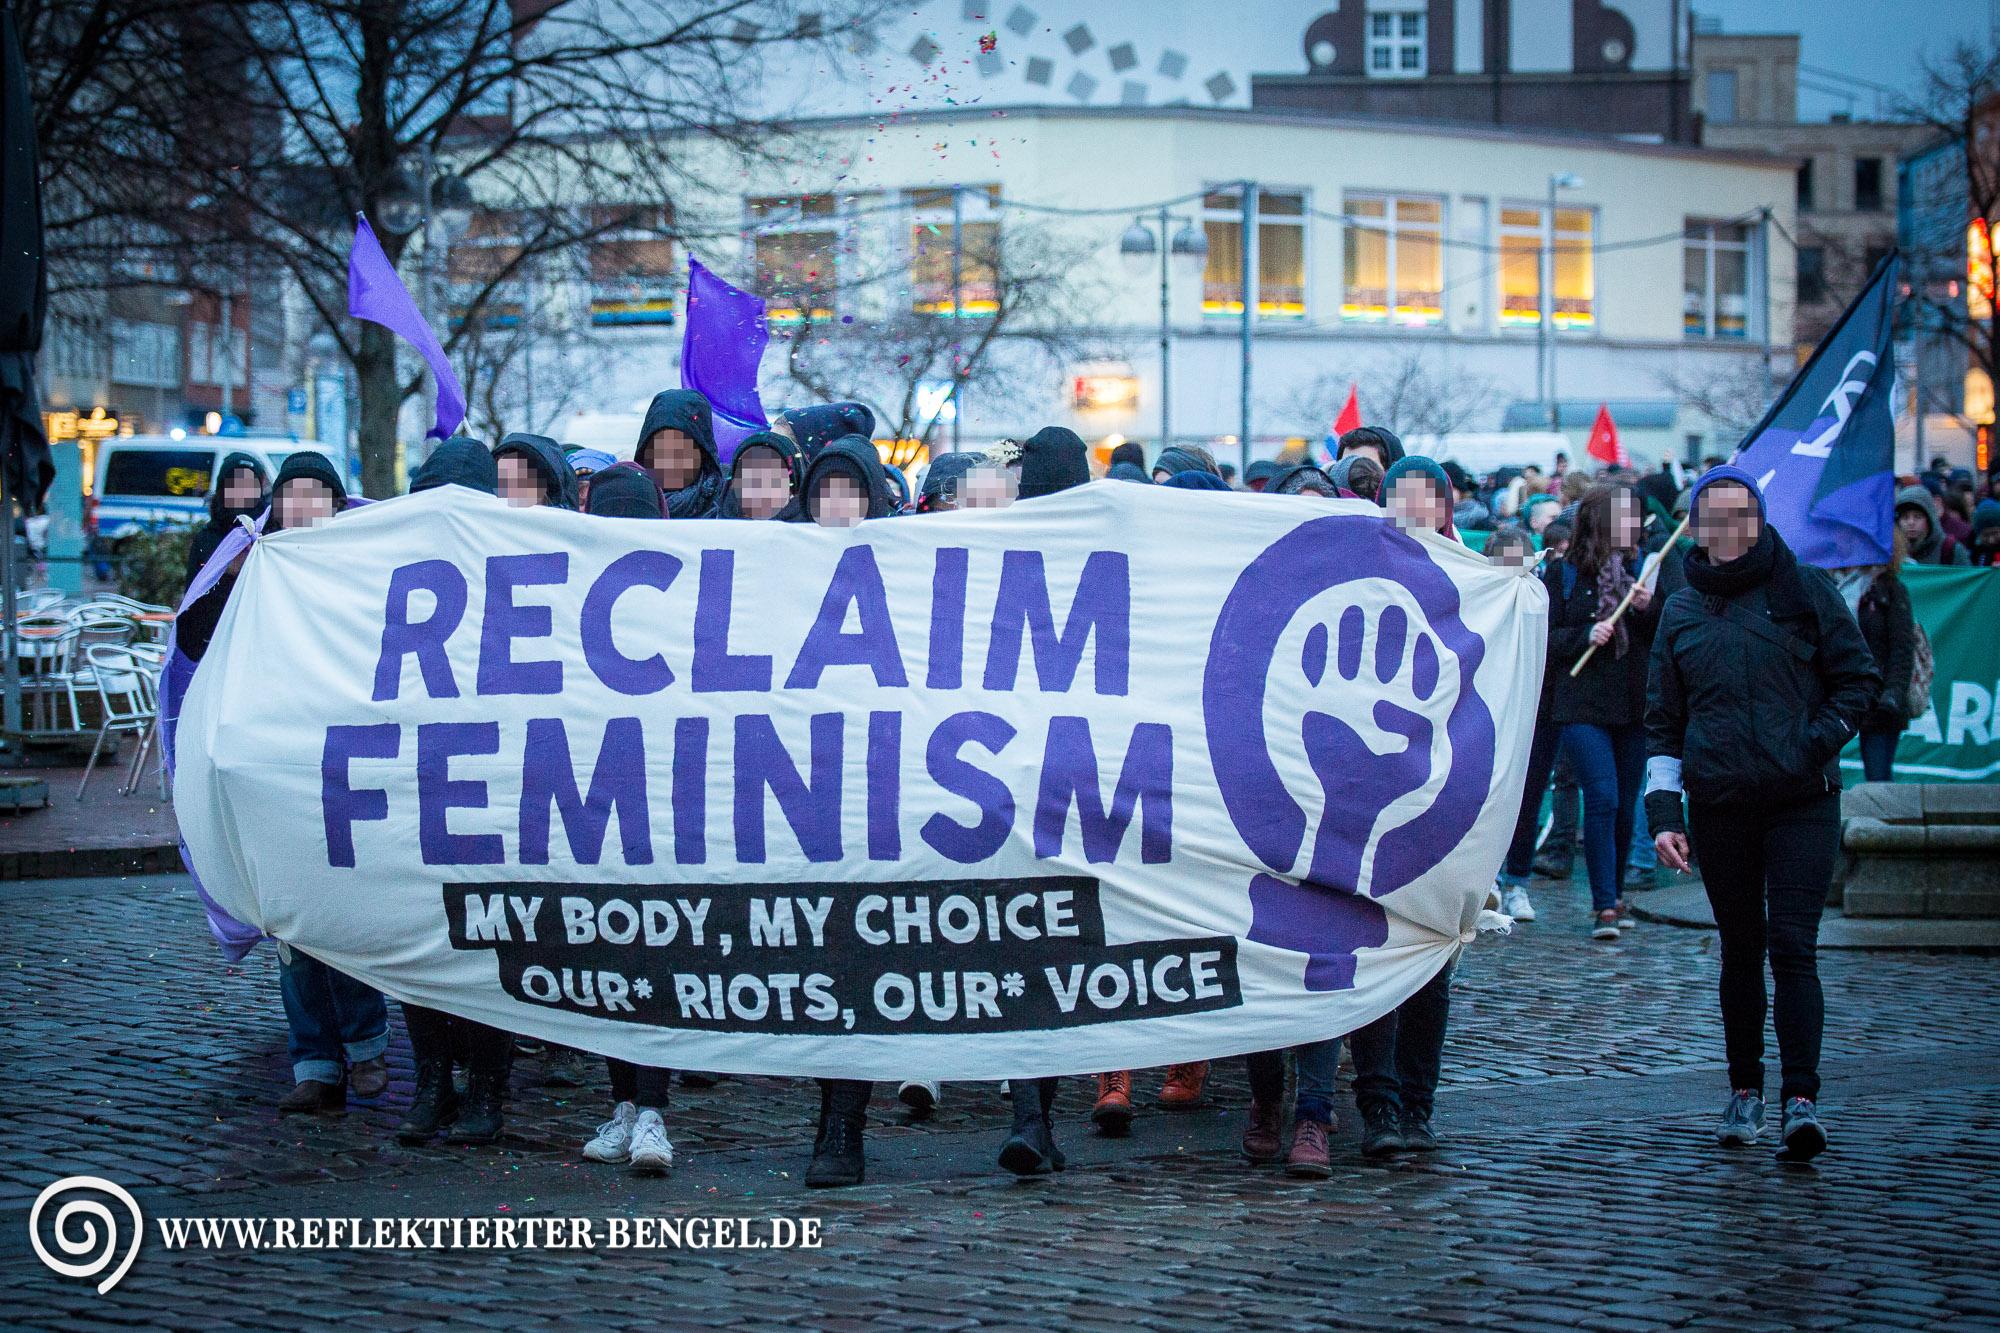 08.03.18 Hannover - Demo Frauenkampftag- Demo Frauenkampftag